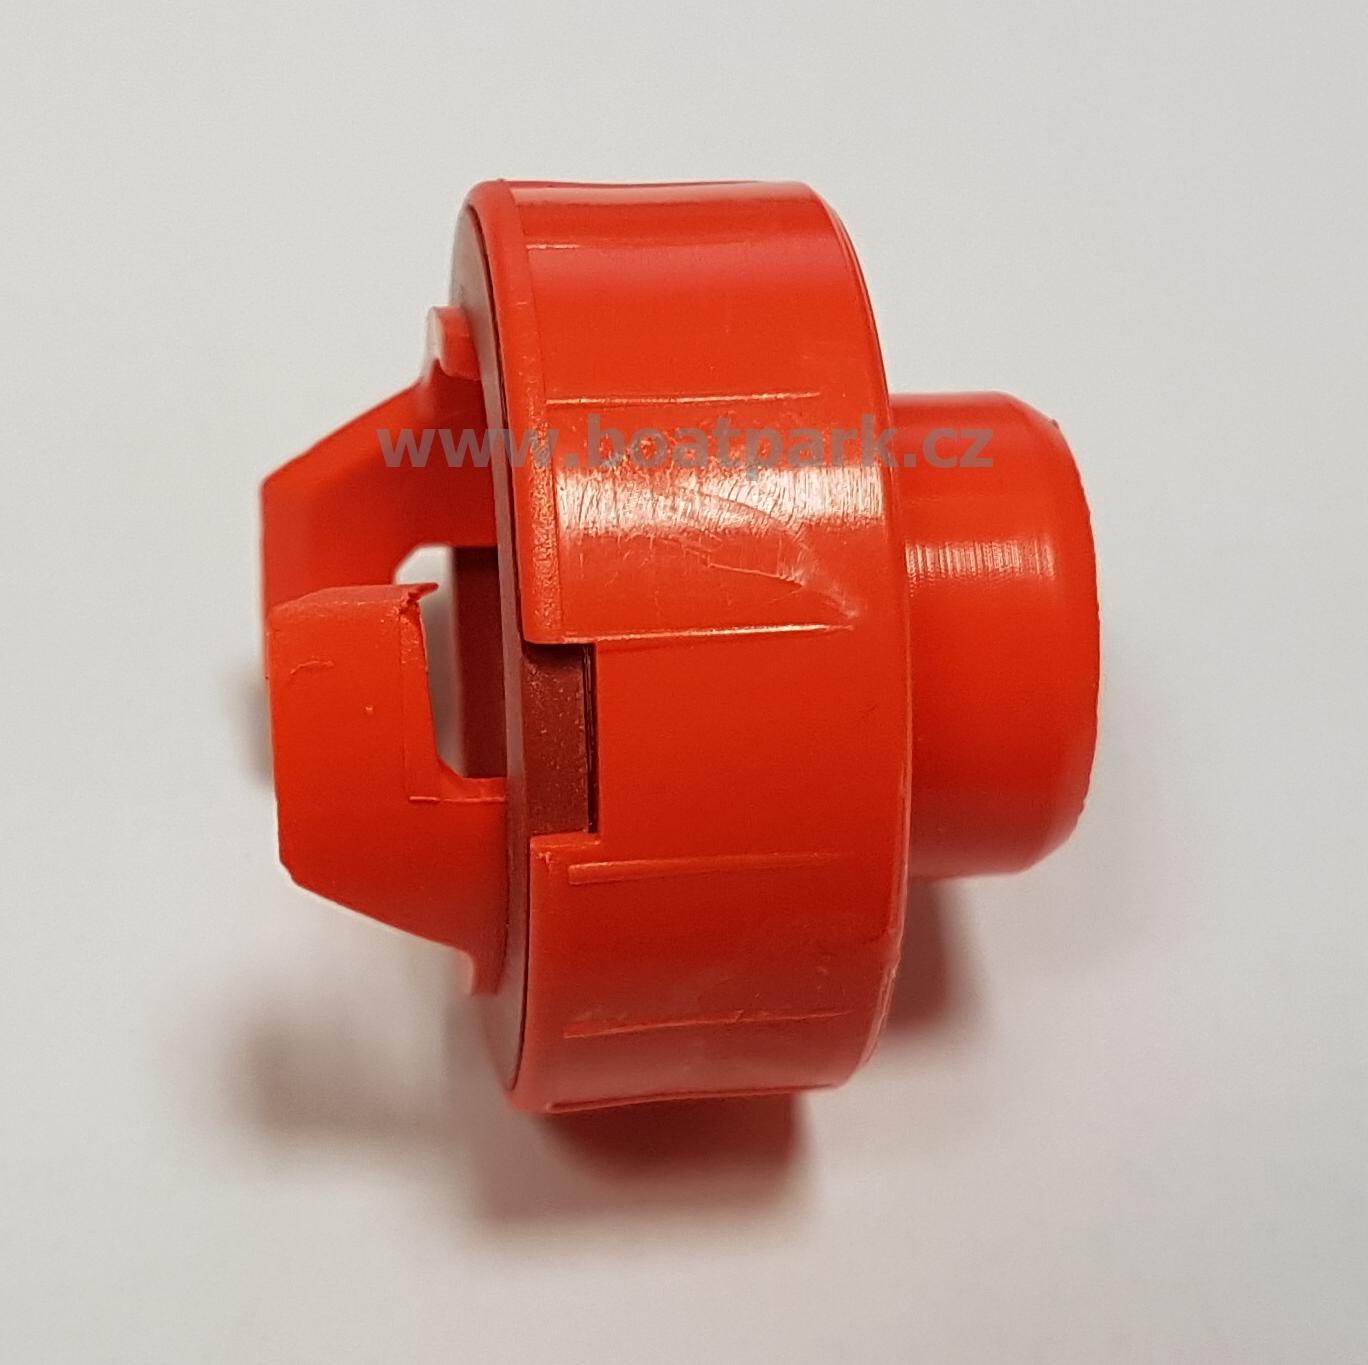 Bravo redukce SP216 orange Turbomax.jpg